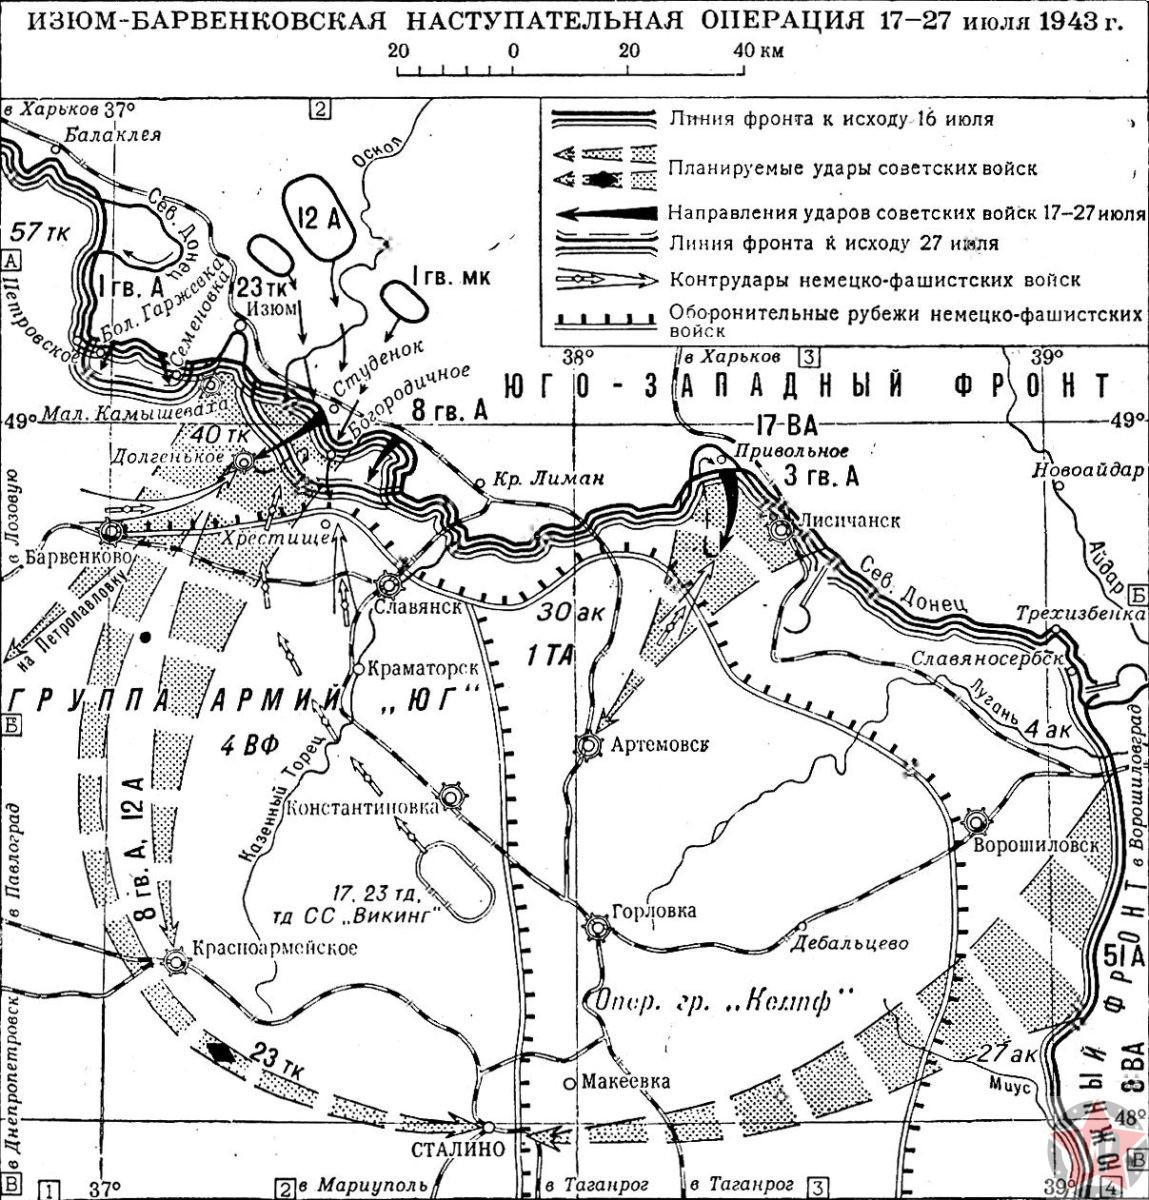 Изюм-Барвенковская наступательная операция